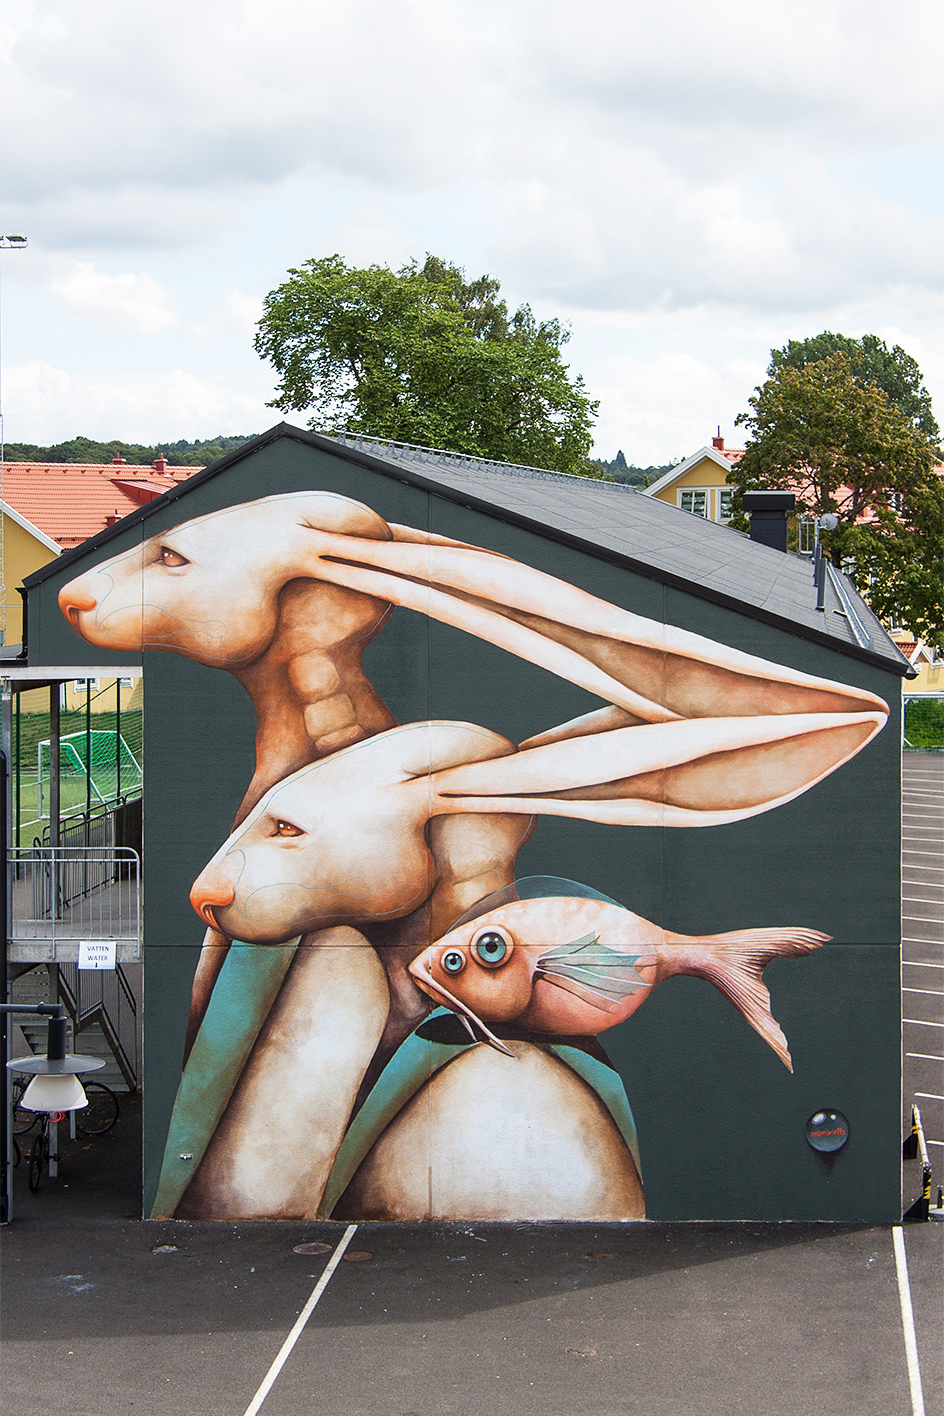 ANAMARIA_Artscape_2016-08-01_FredrikÅkerberg_944x1418_14.jpg